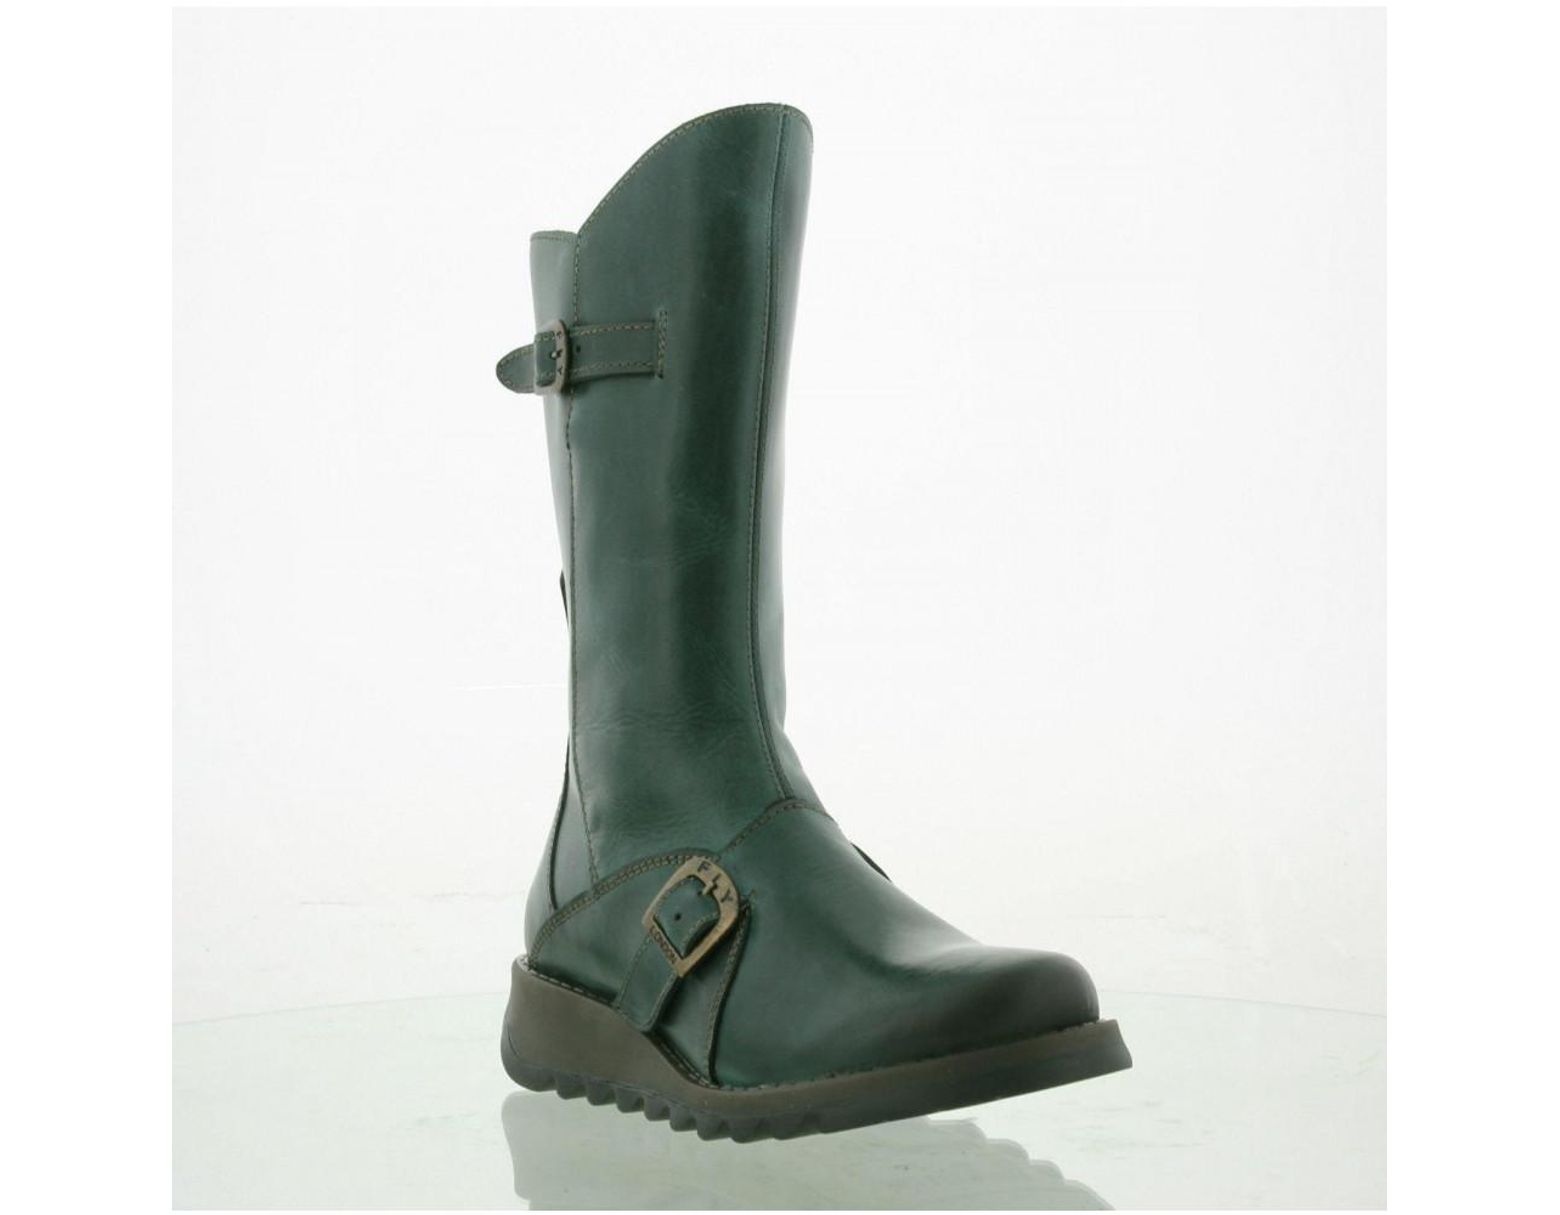 5ad02267432 Women's Green Mes 2 Wedge Zip Up Boots